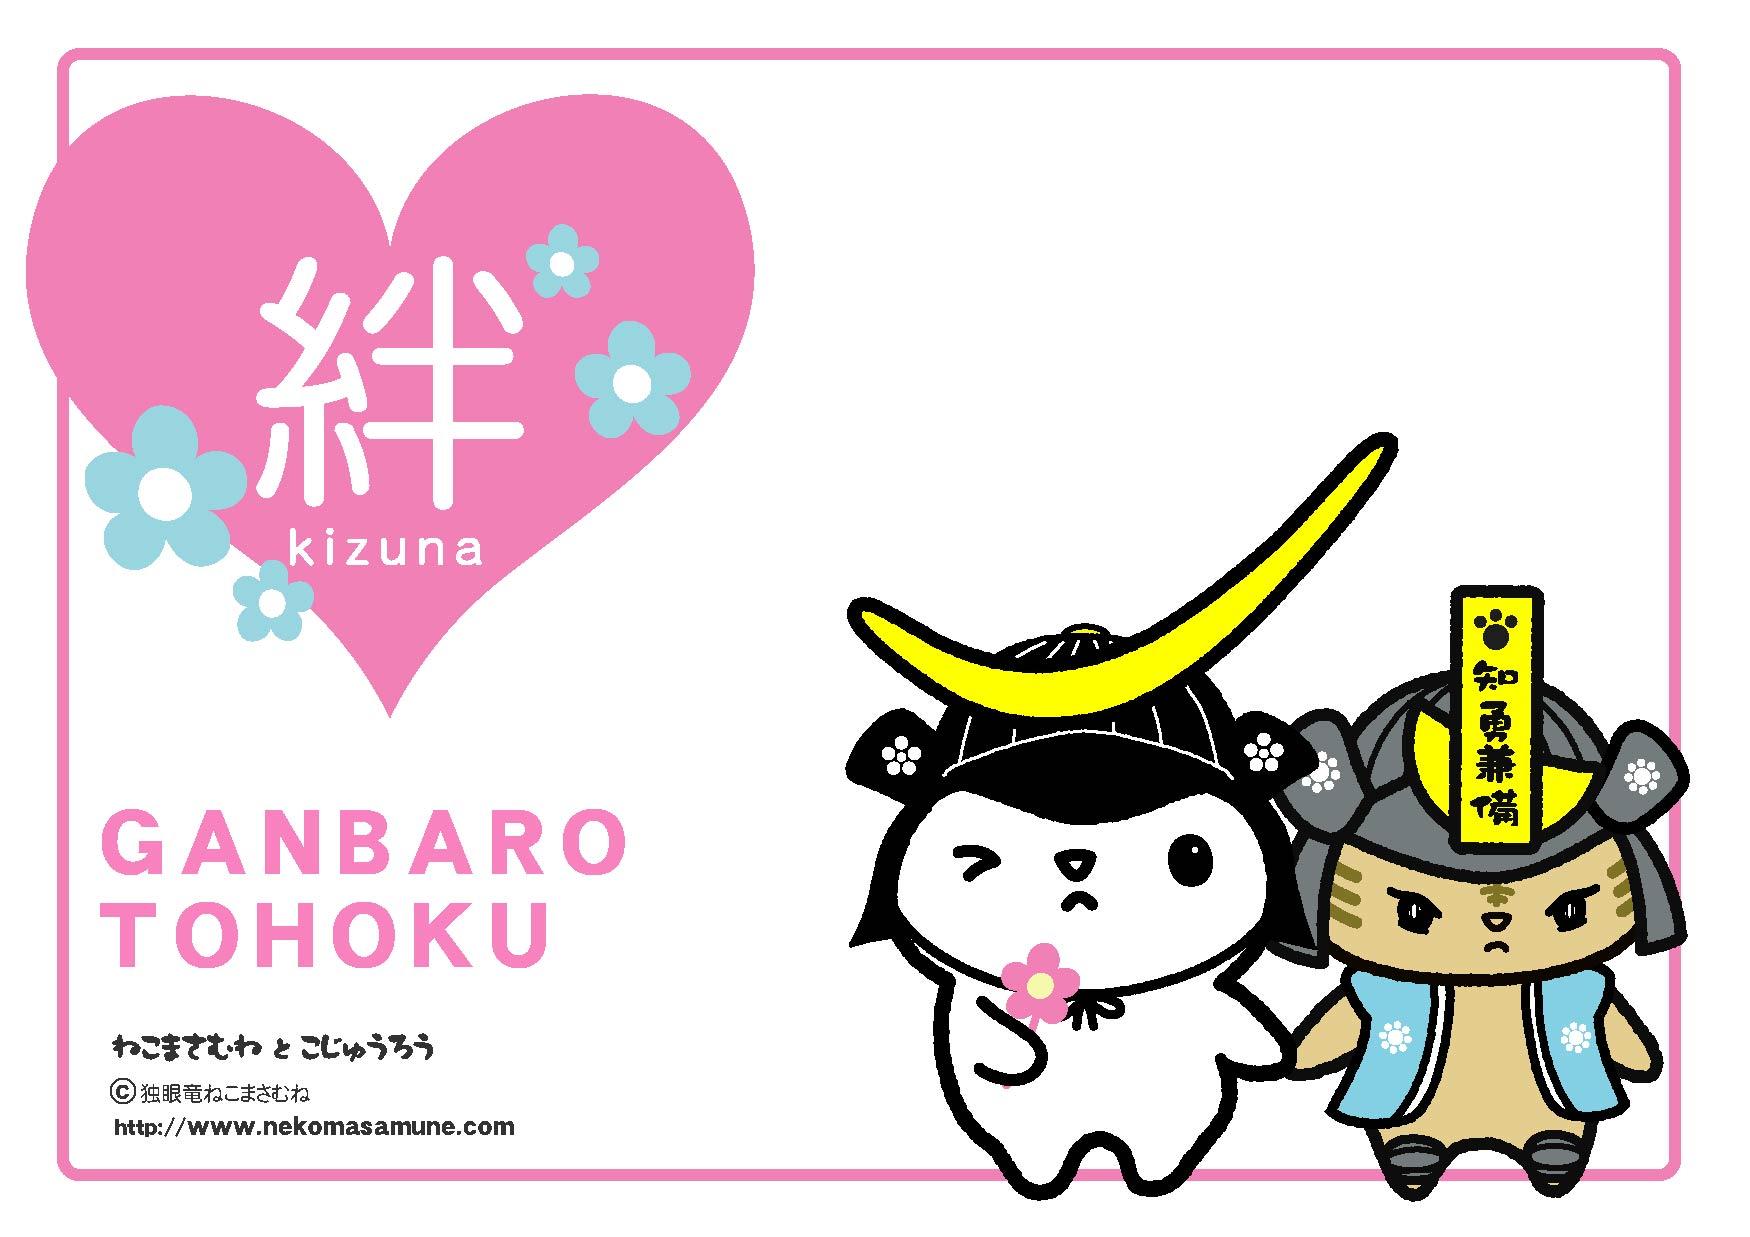 東日本大震災支援GANBARO TOHOKU「絆」ロゴ復興支援ポスター